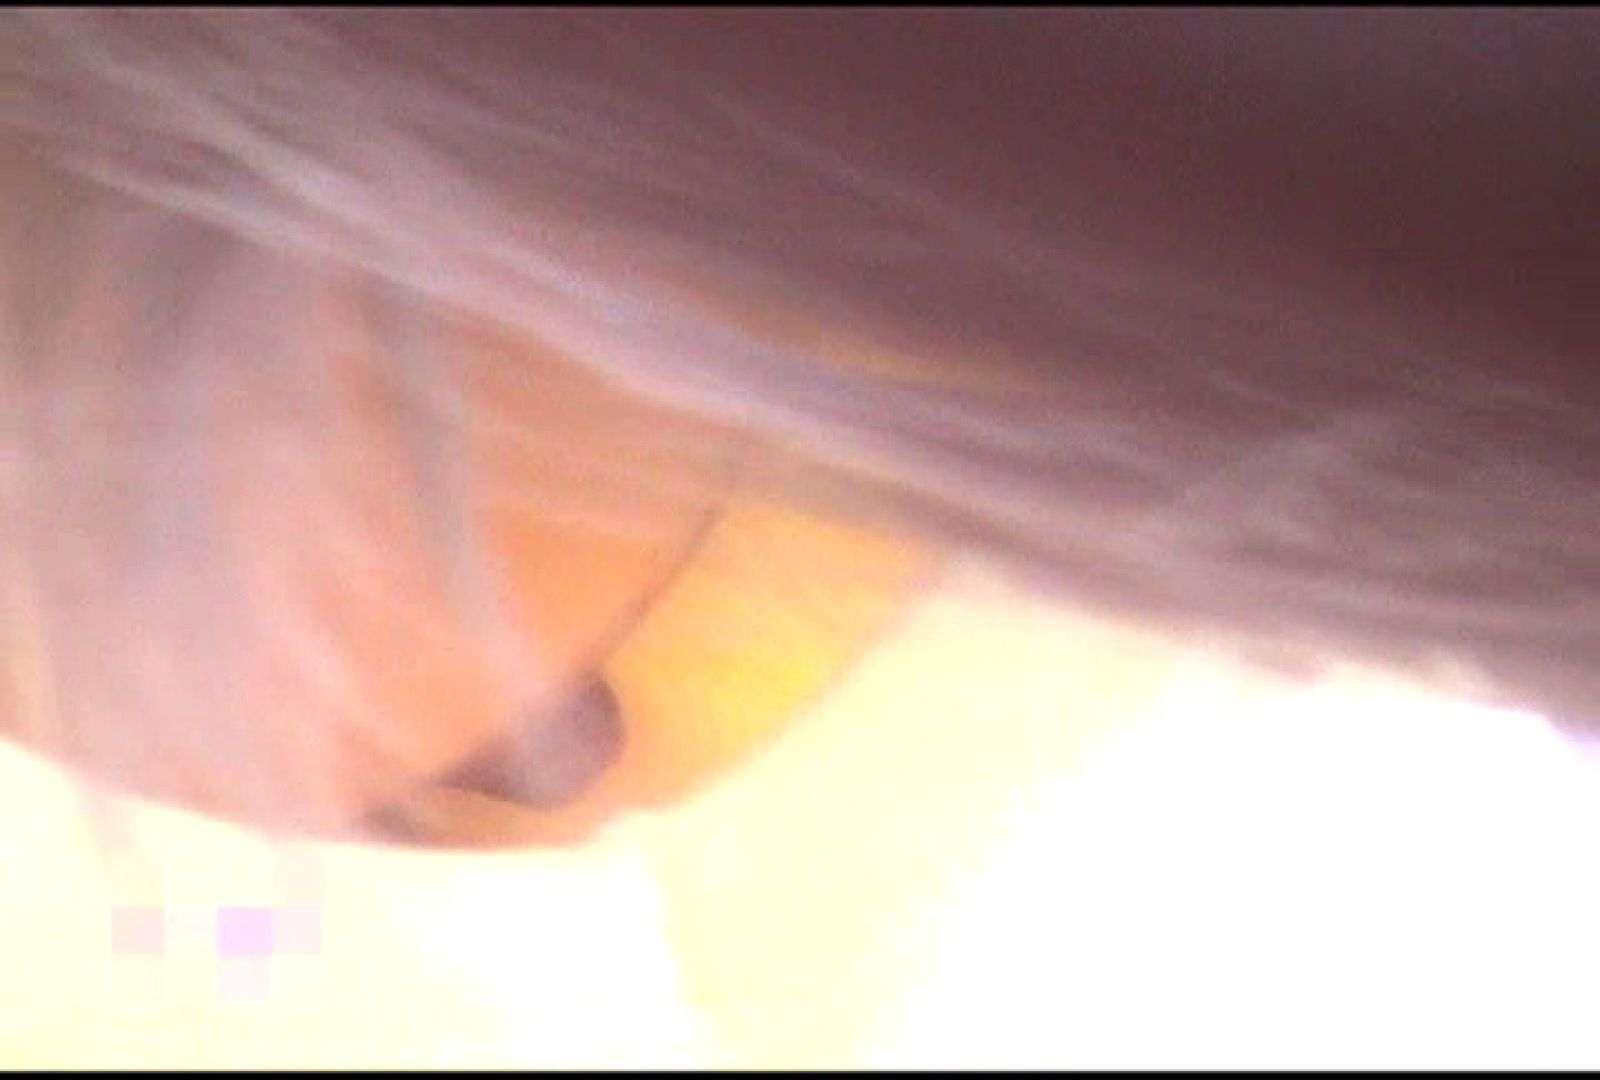 熱視線Vol.1 チクビ 盗撮画像 59画像 52